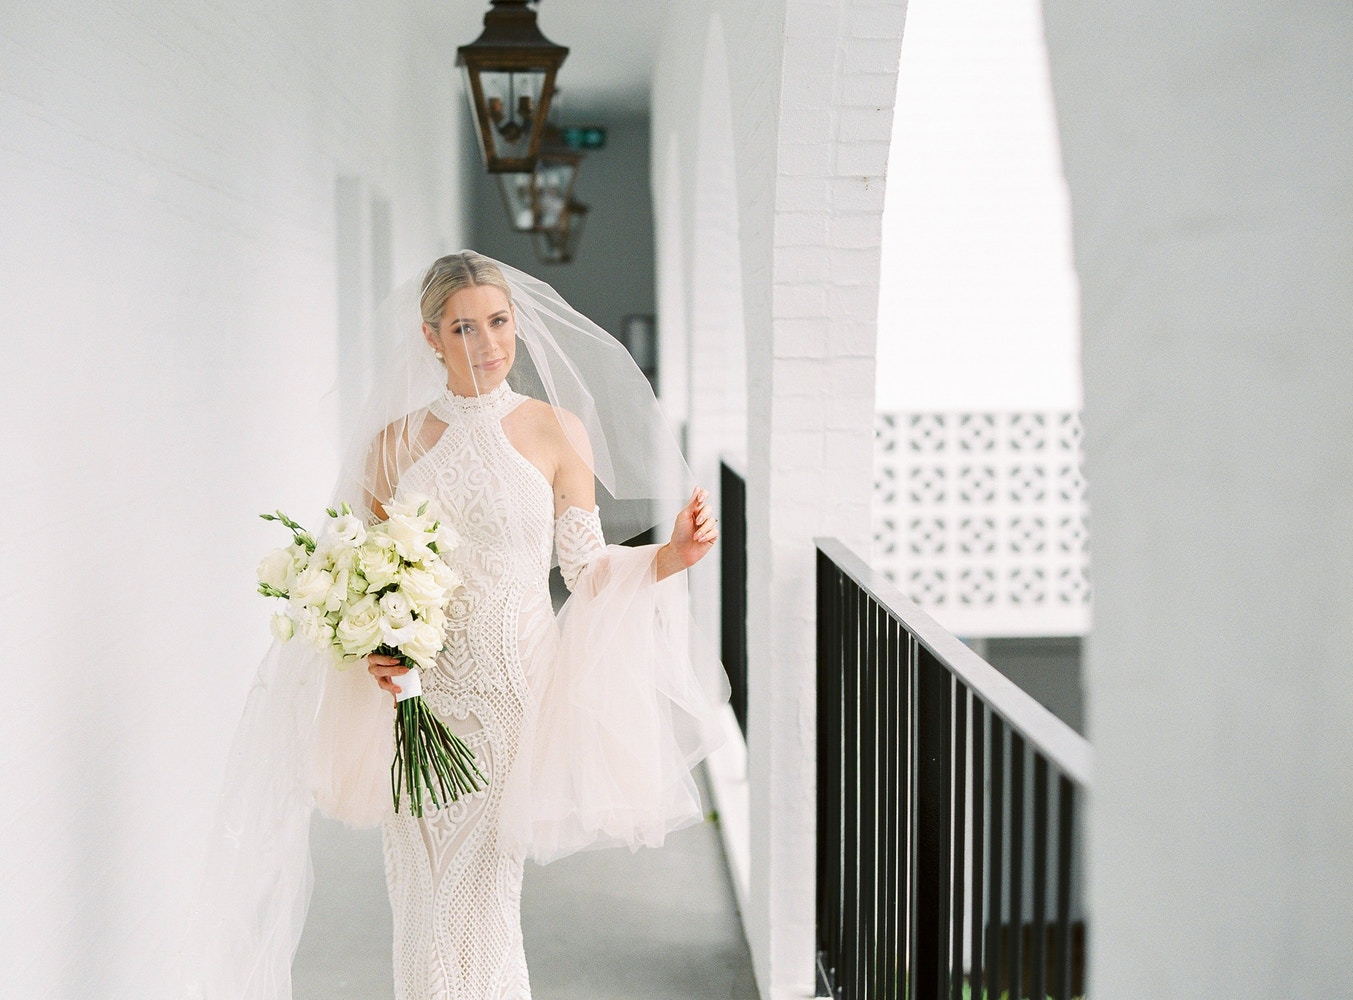 A PERFECTLY SWEET WEDDING